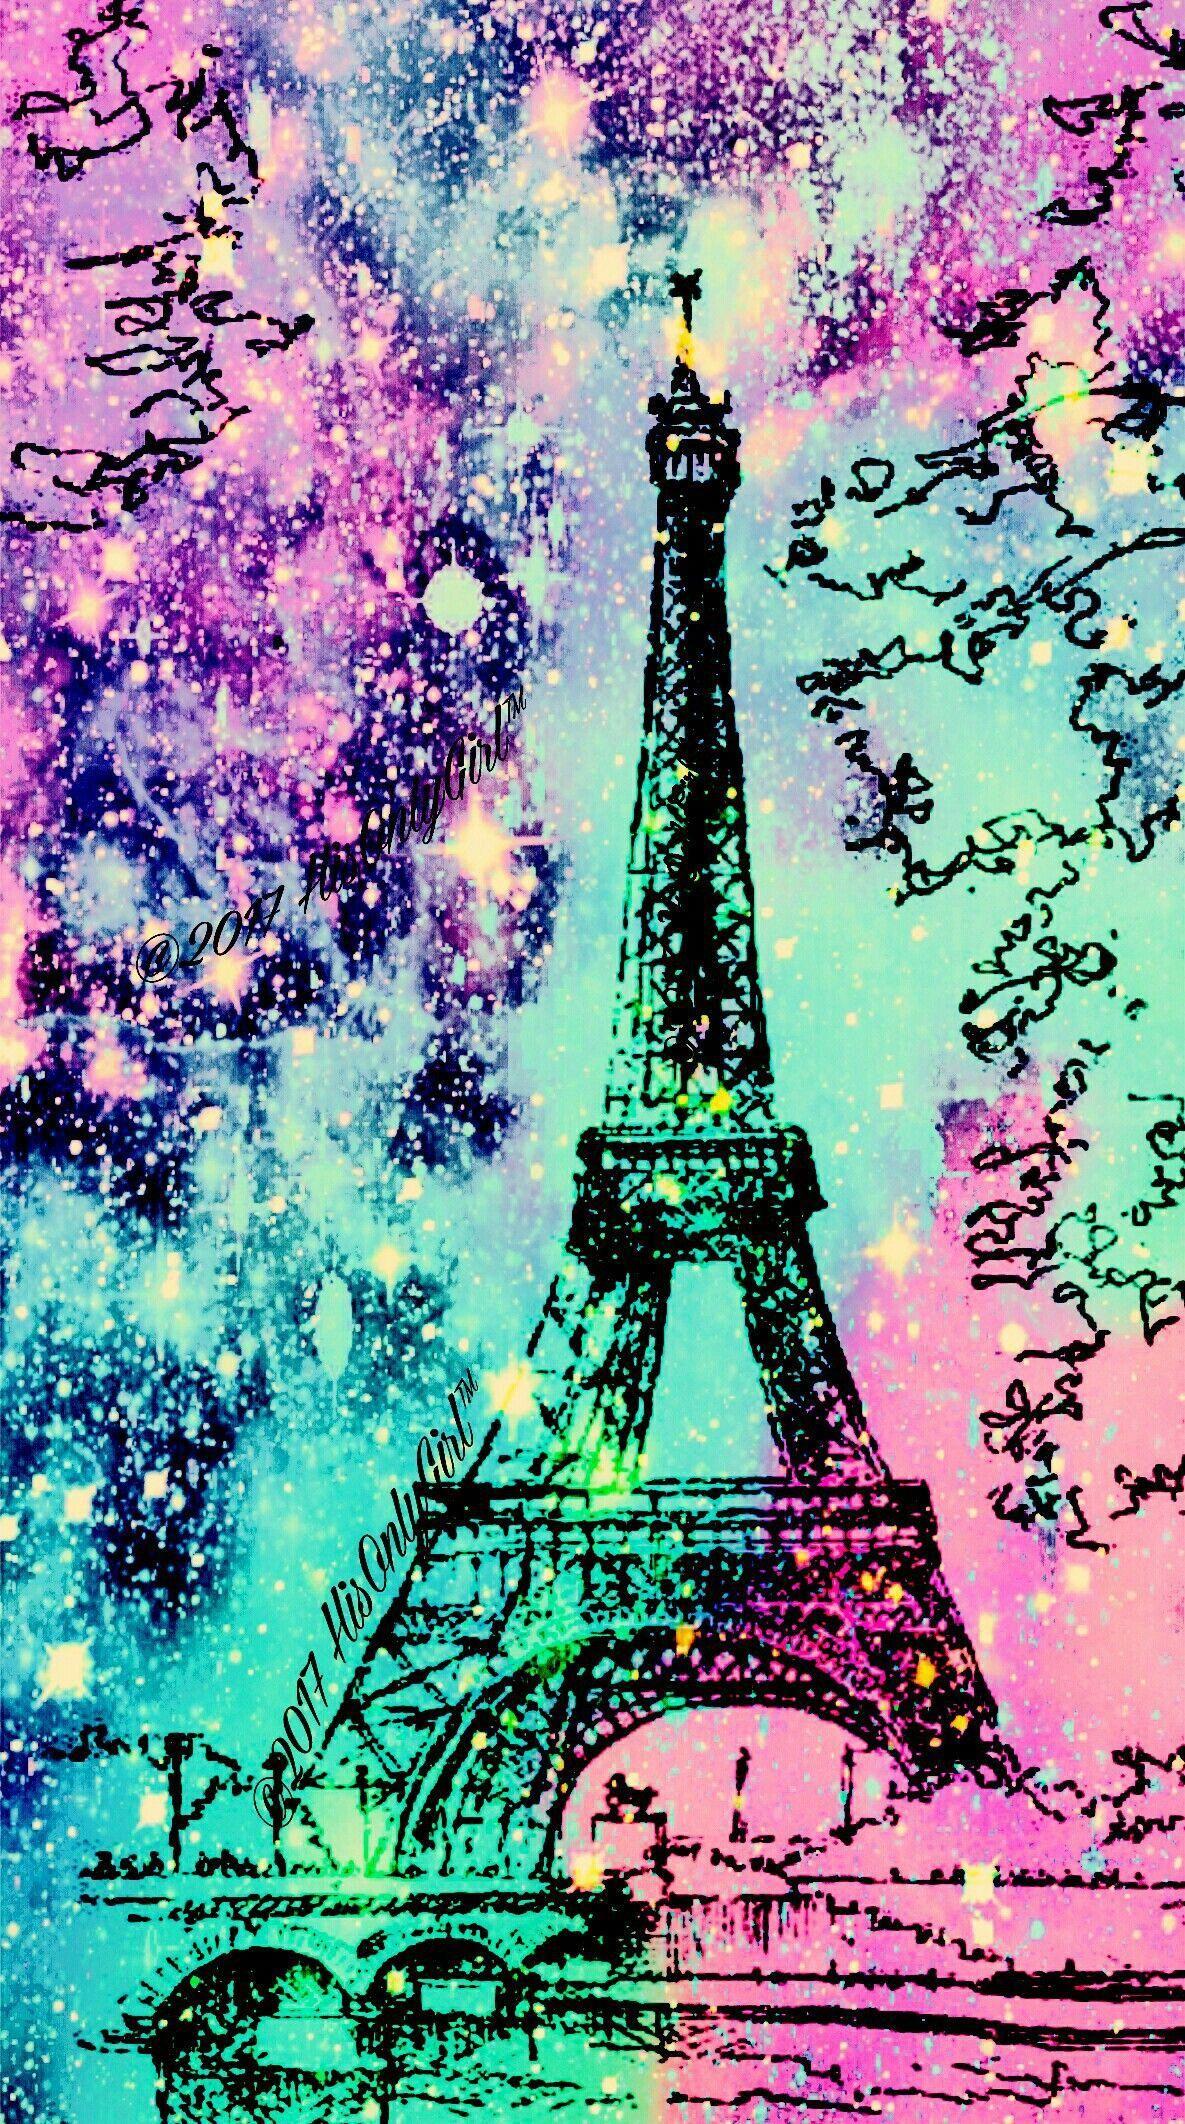 Eiffel Tower Galaxy Wallpaper I Created For The App Cocoppa Pariswallpaper Paris Wallpaper Eiffel Tower Galaxy Wallpaper